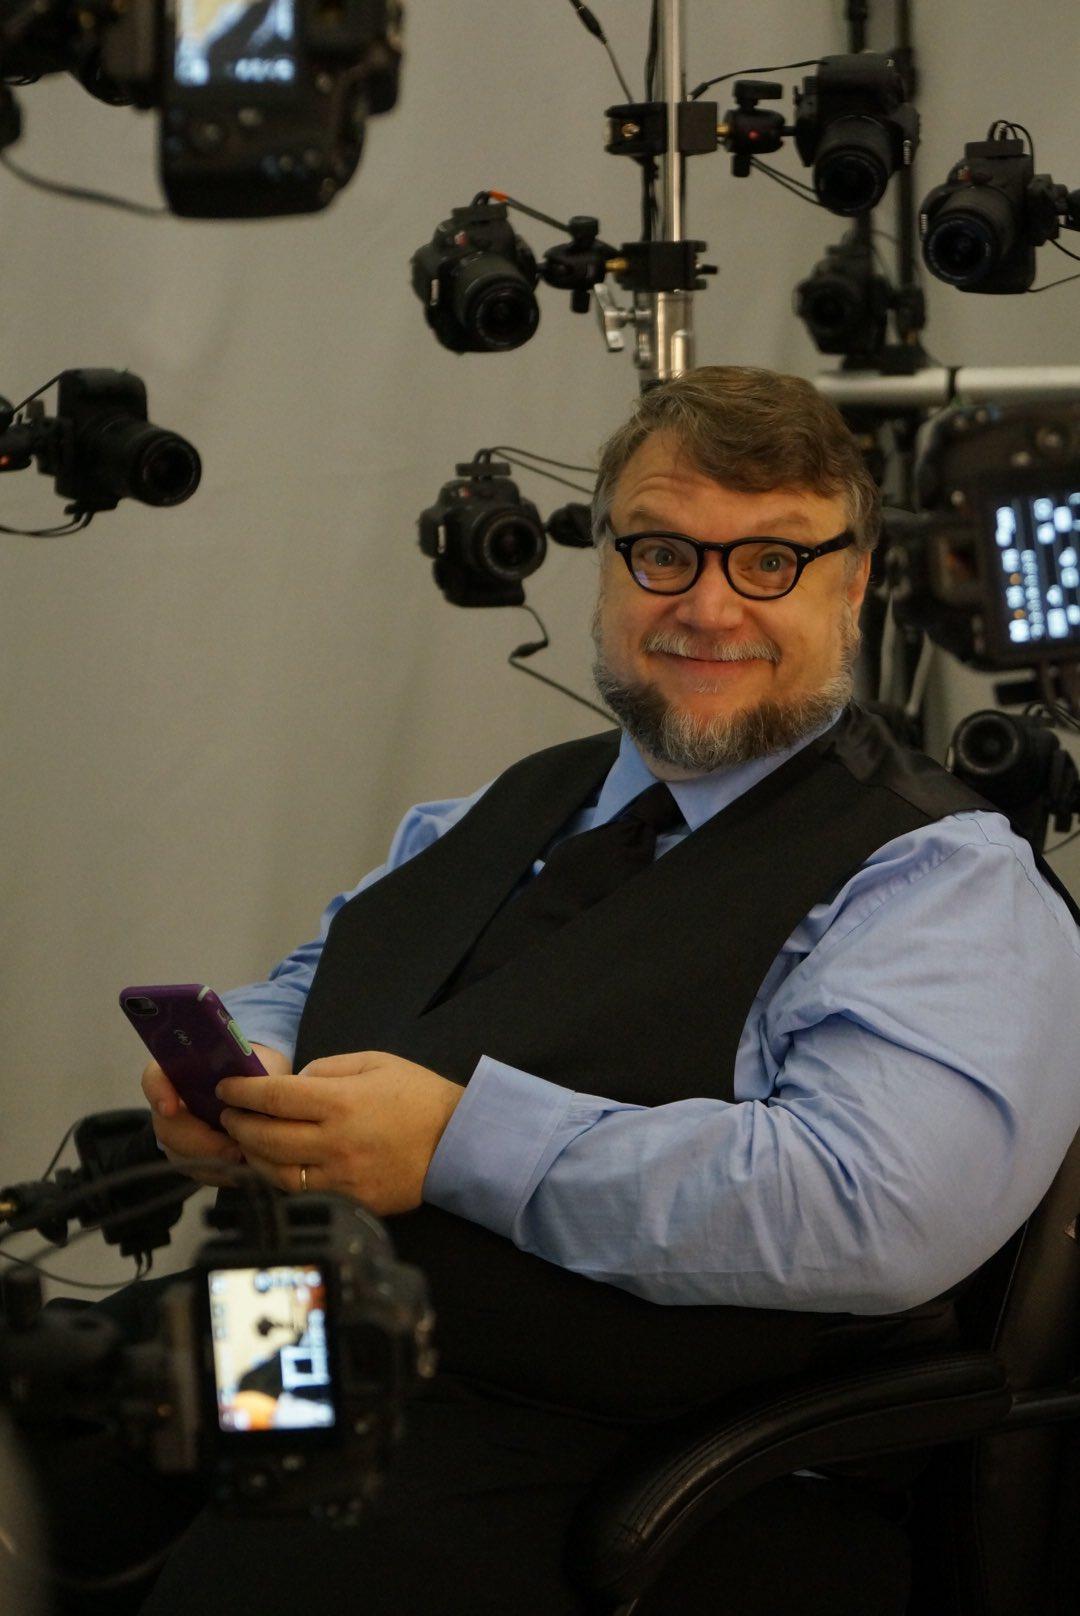 Guillermo del Toro en studio 3D scanning pour Death Stranding